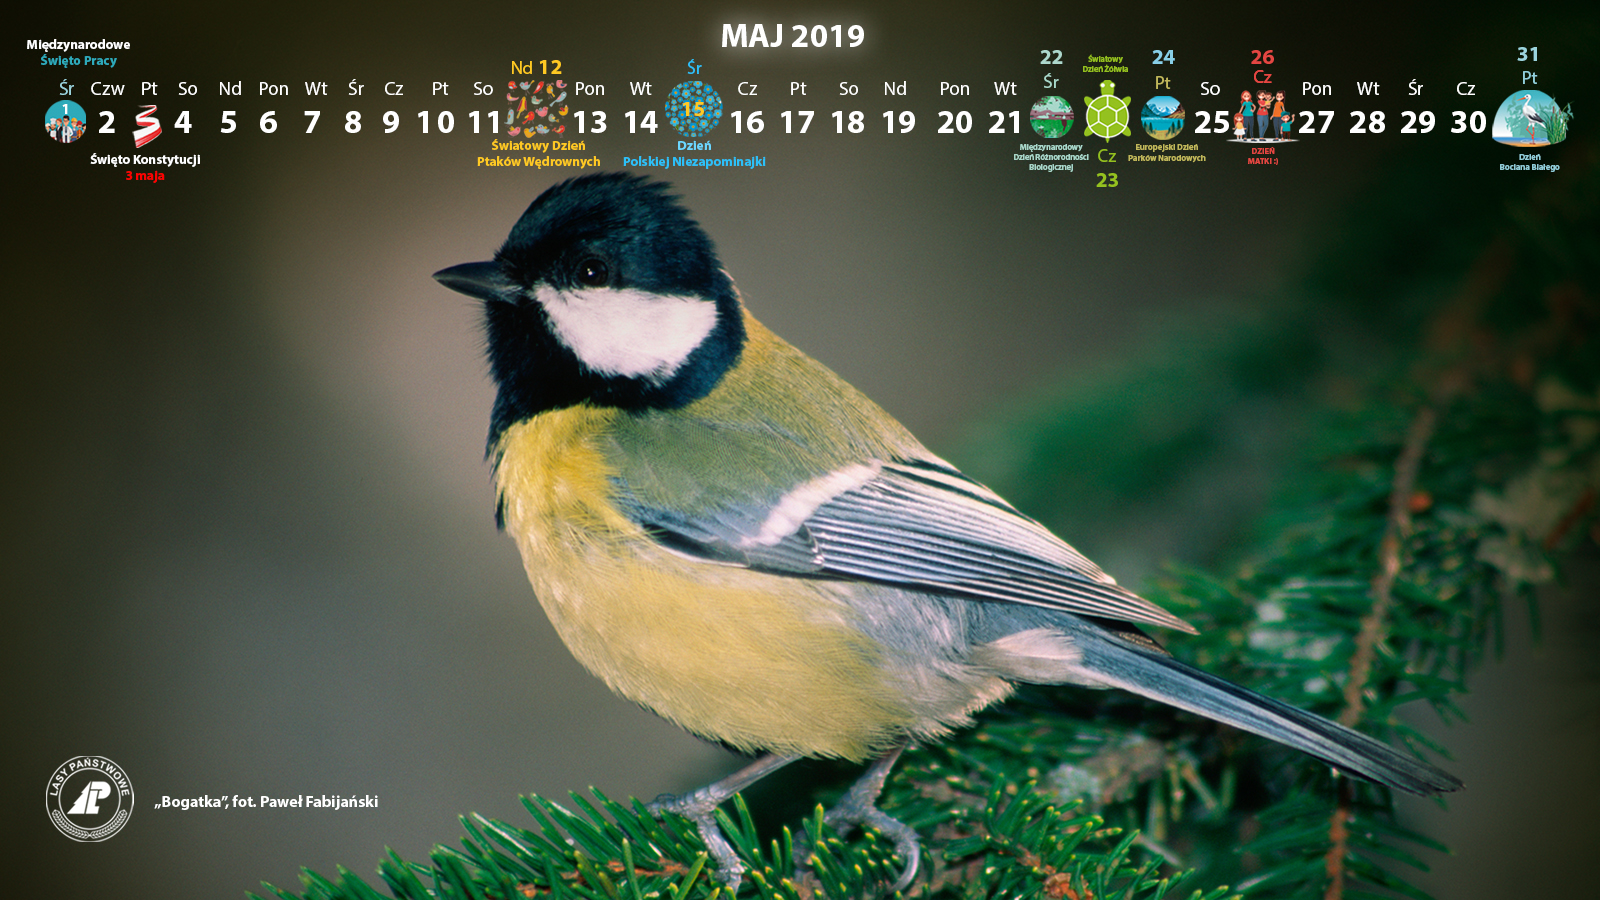 Kalendarz_maj_2019_1600x900[1].jpg